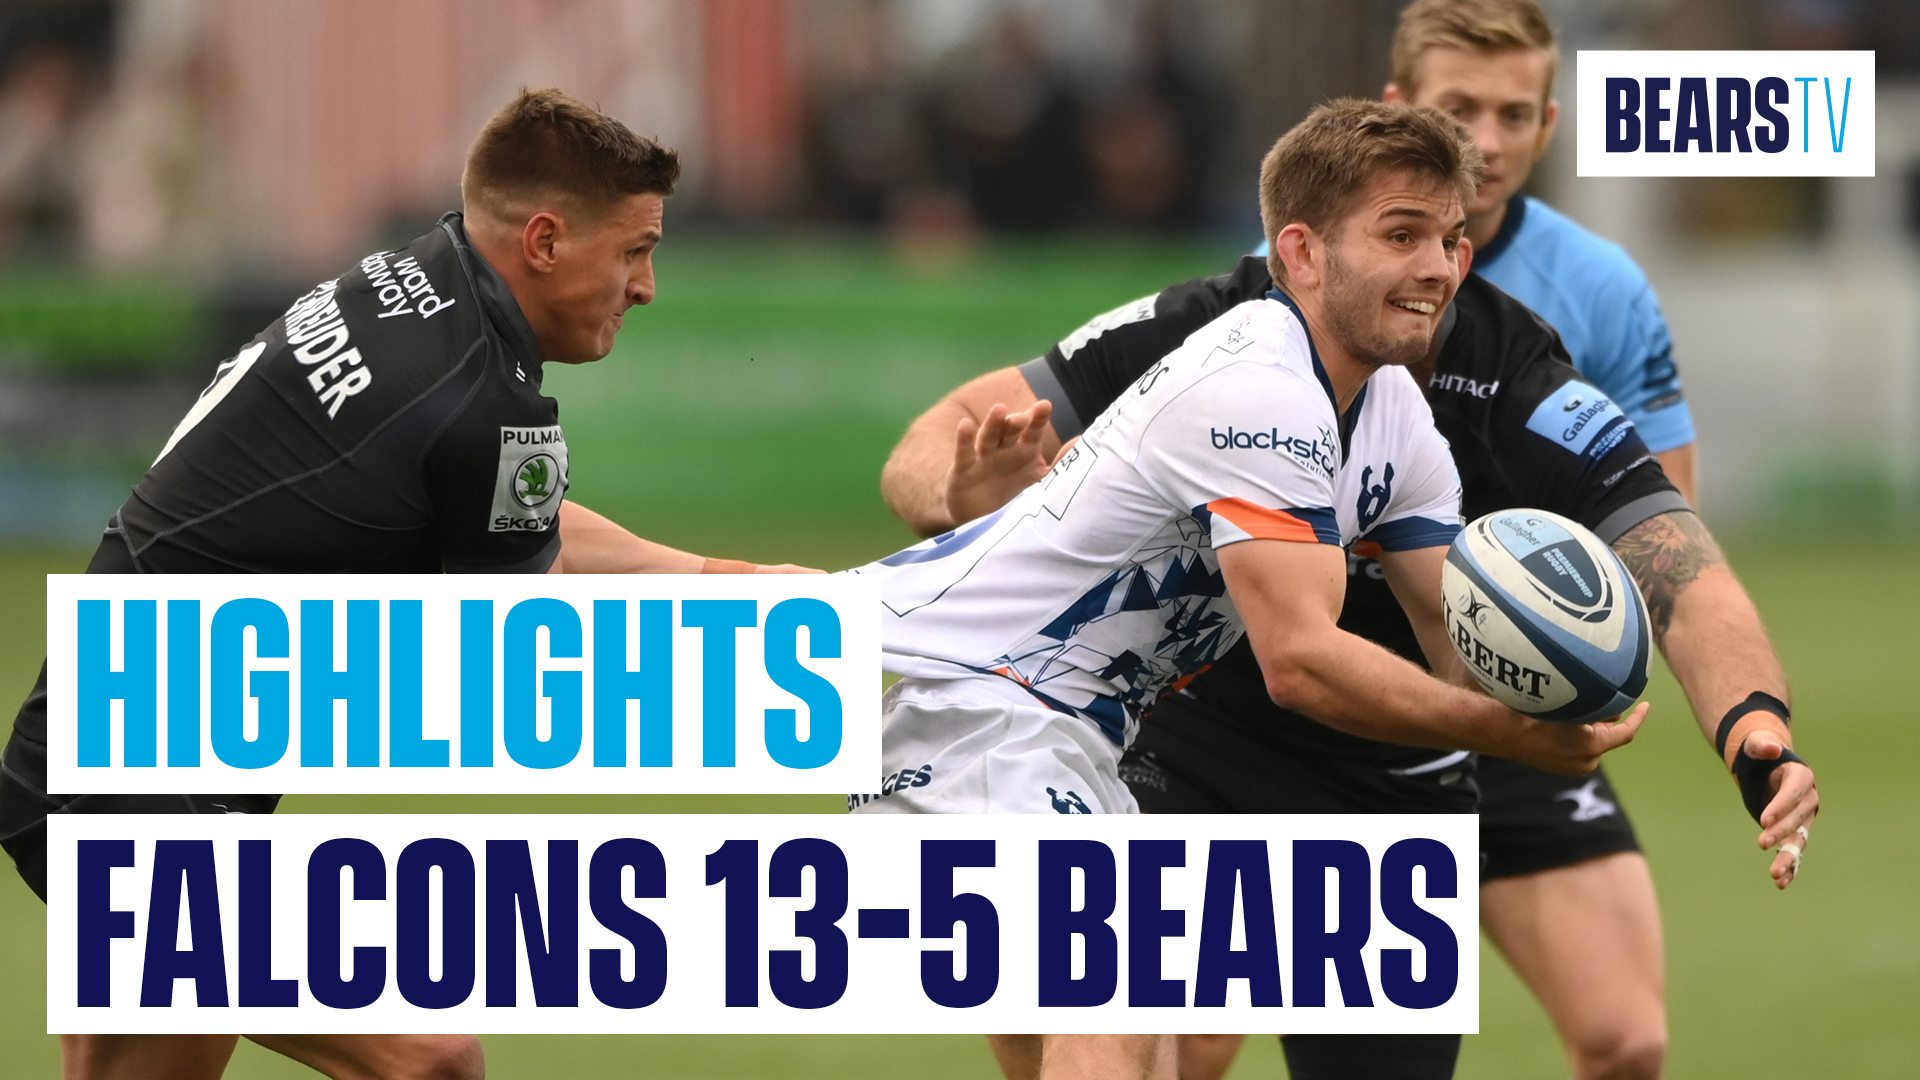 Highlights: Newcastle Falcons 13-5 Bristol Bears